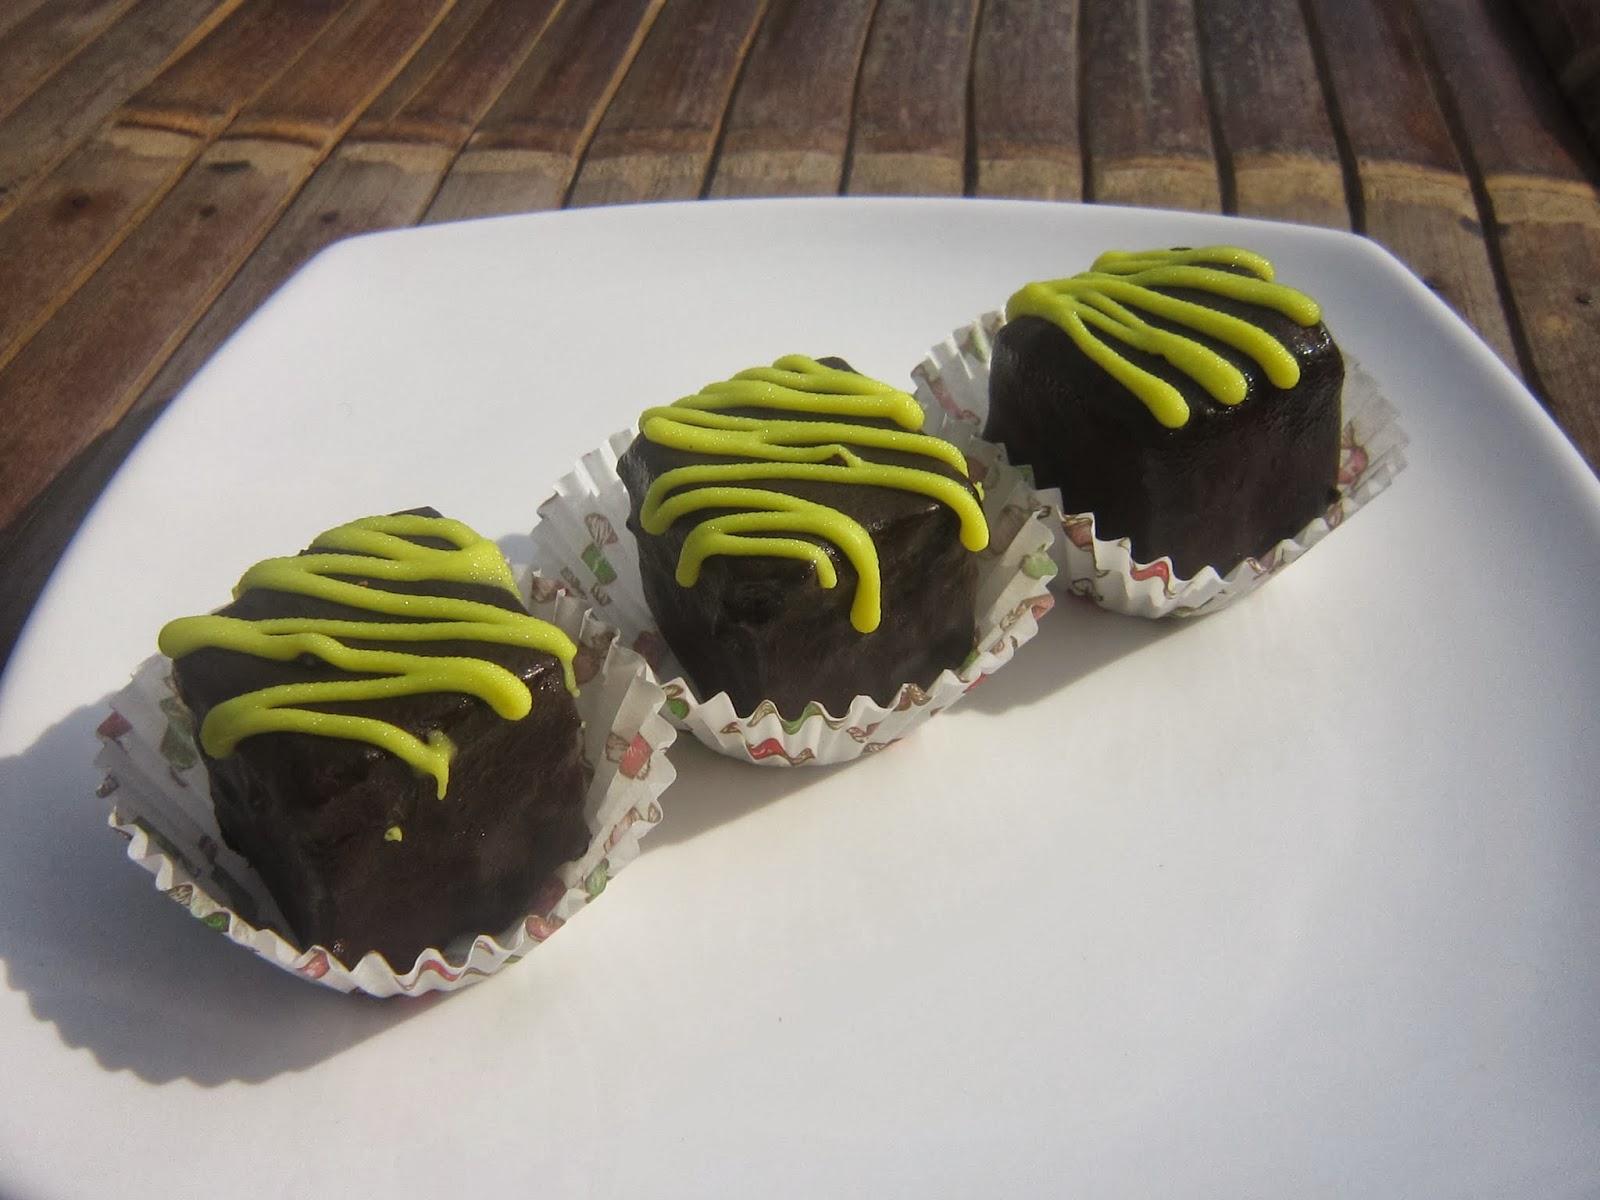 Journal Ibu Hanif Petit Four I Cake Coklat Lembut Dengan Baluran Coklat Lumer Dimulut